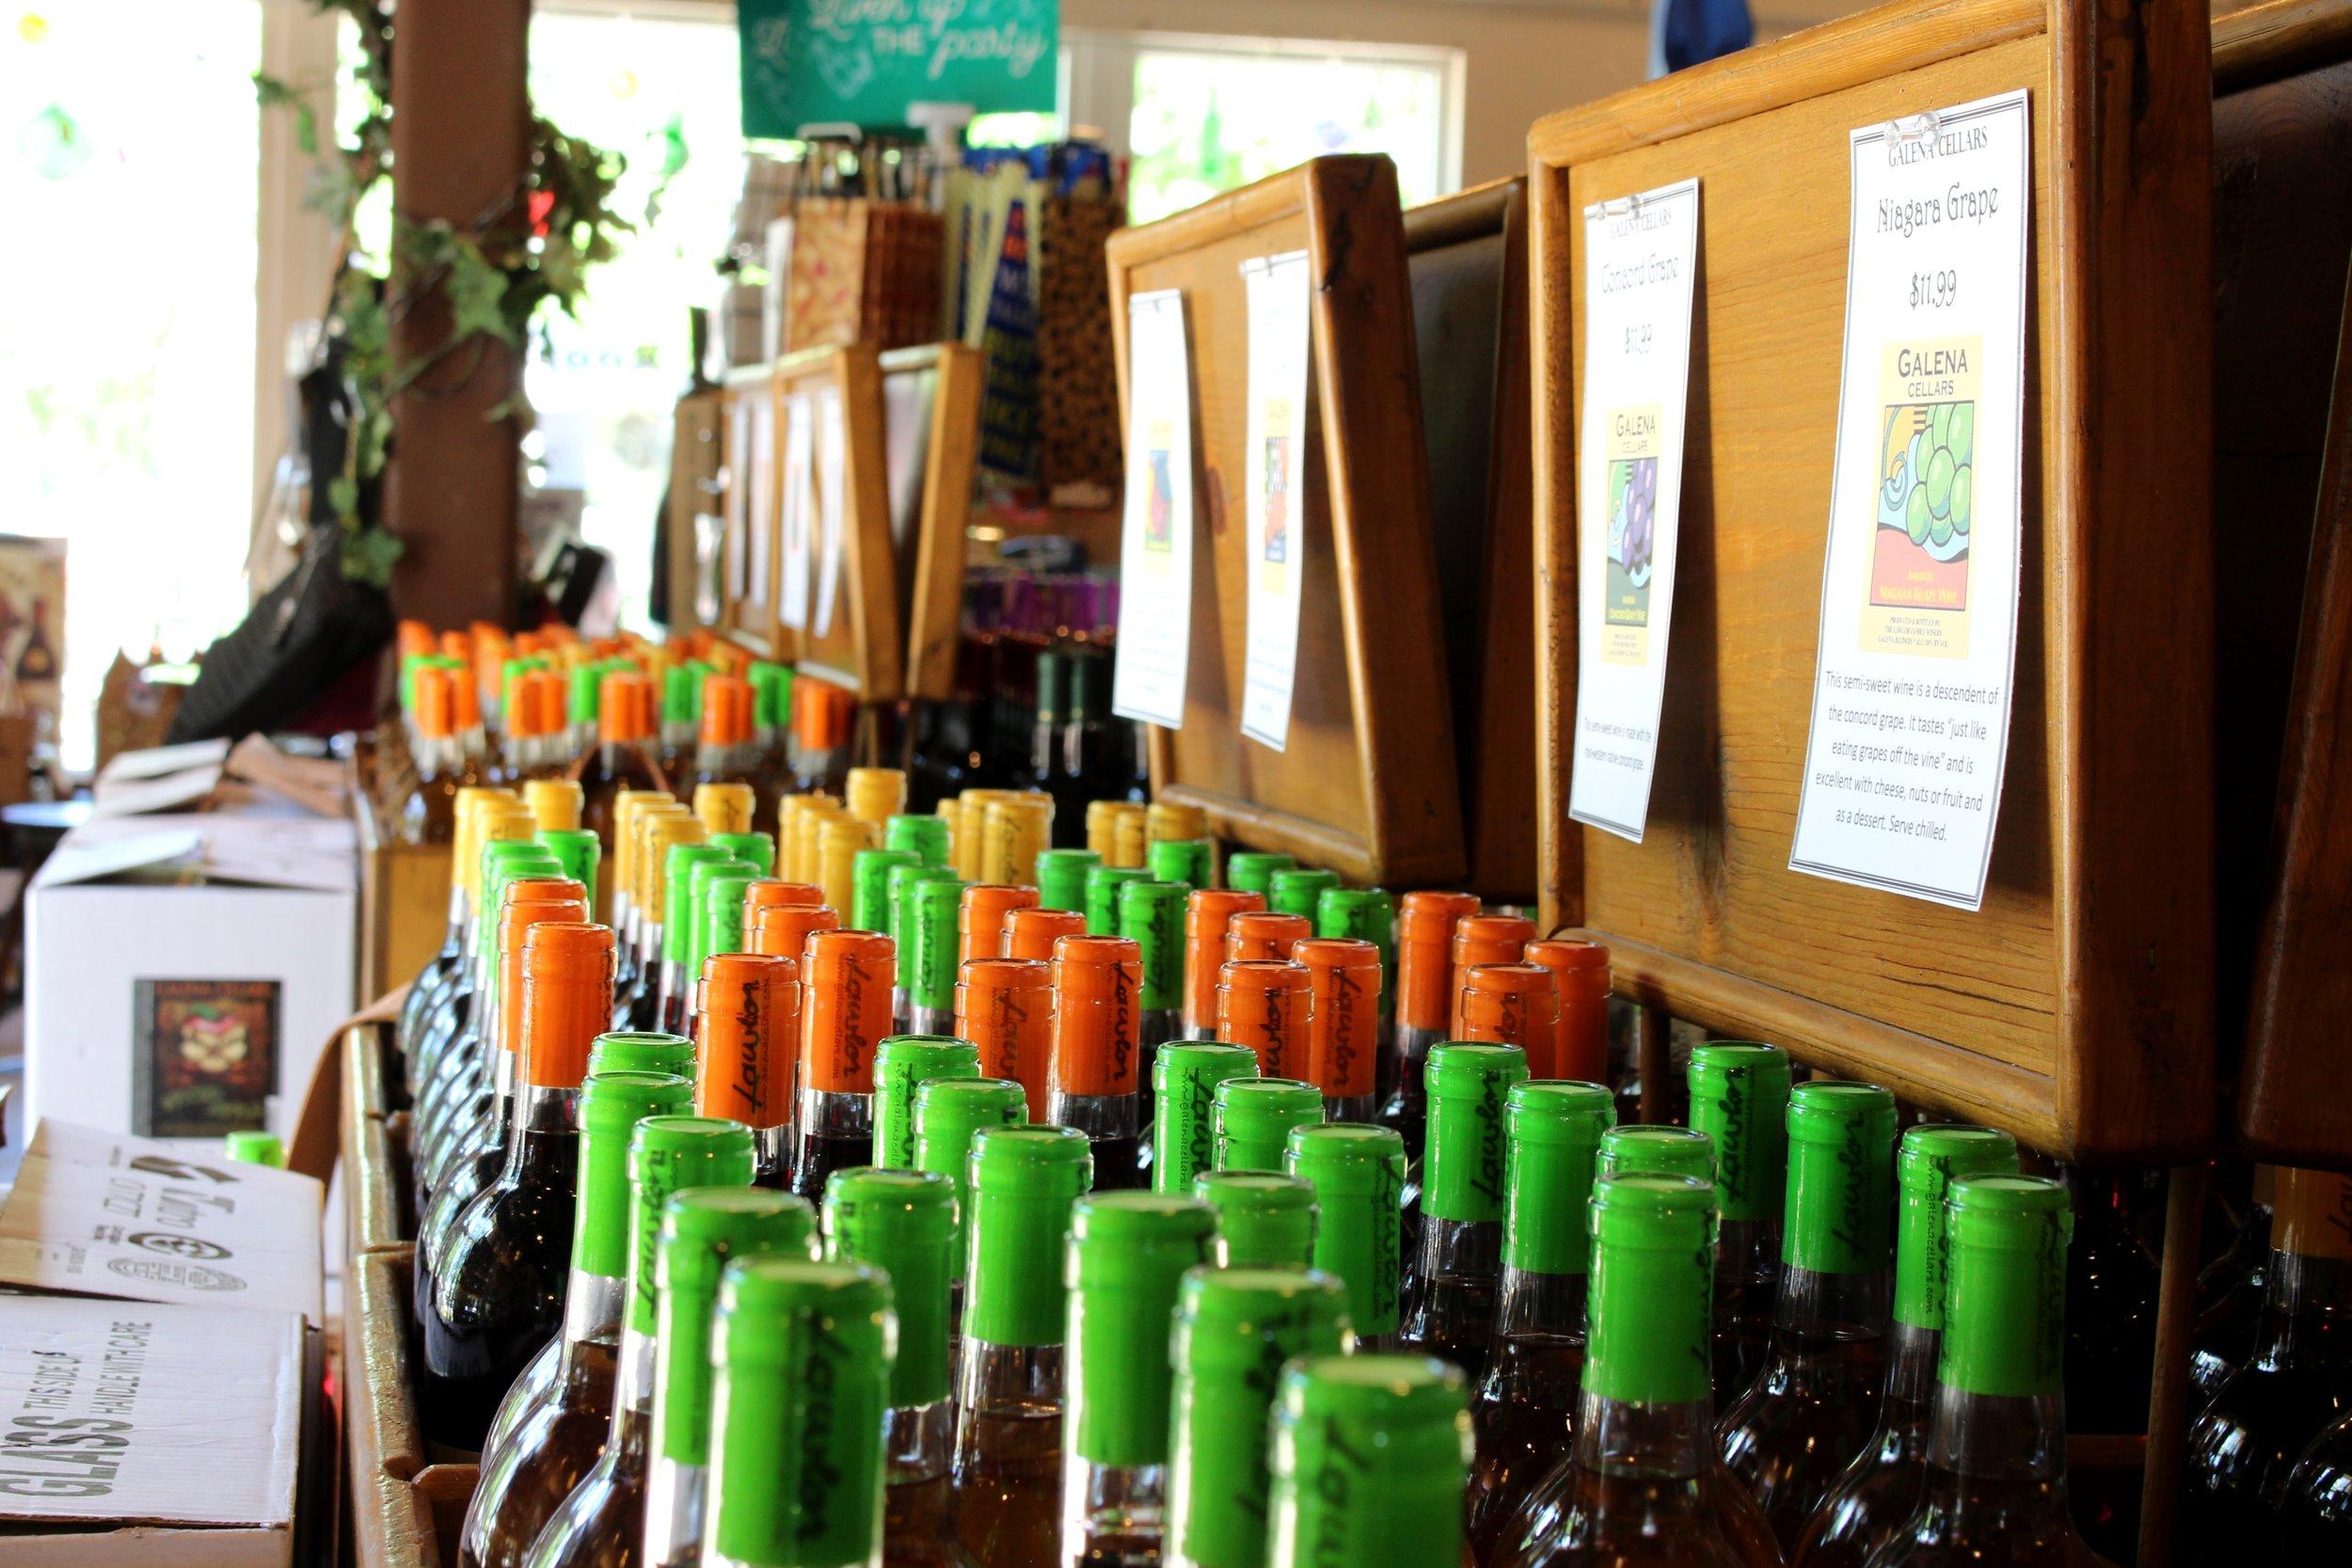 Galena Cellars Bottle Bins